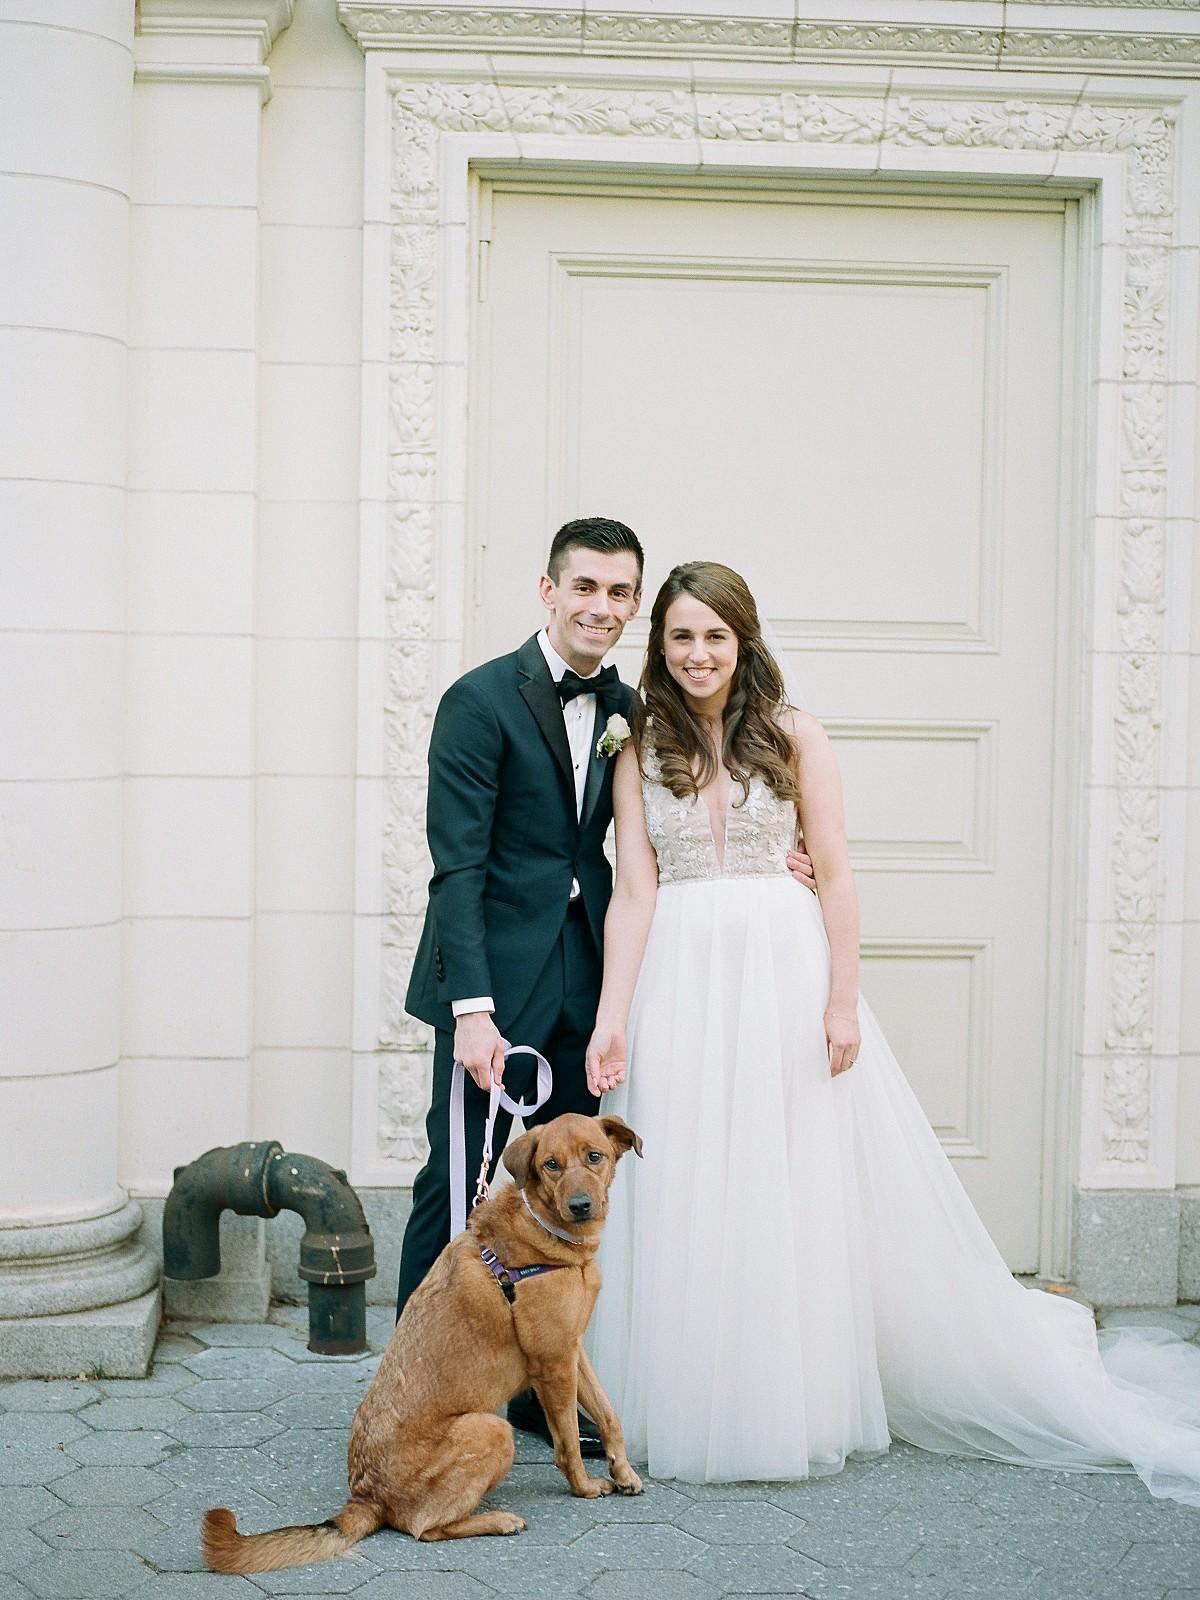 Prospect Park NYC Wedding with Funfetti Wedding Cake!